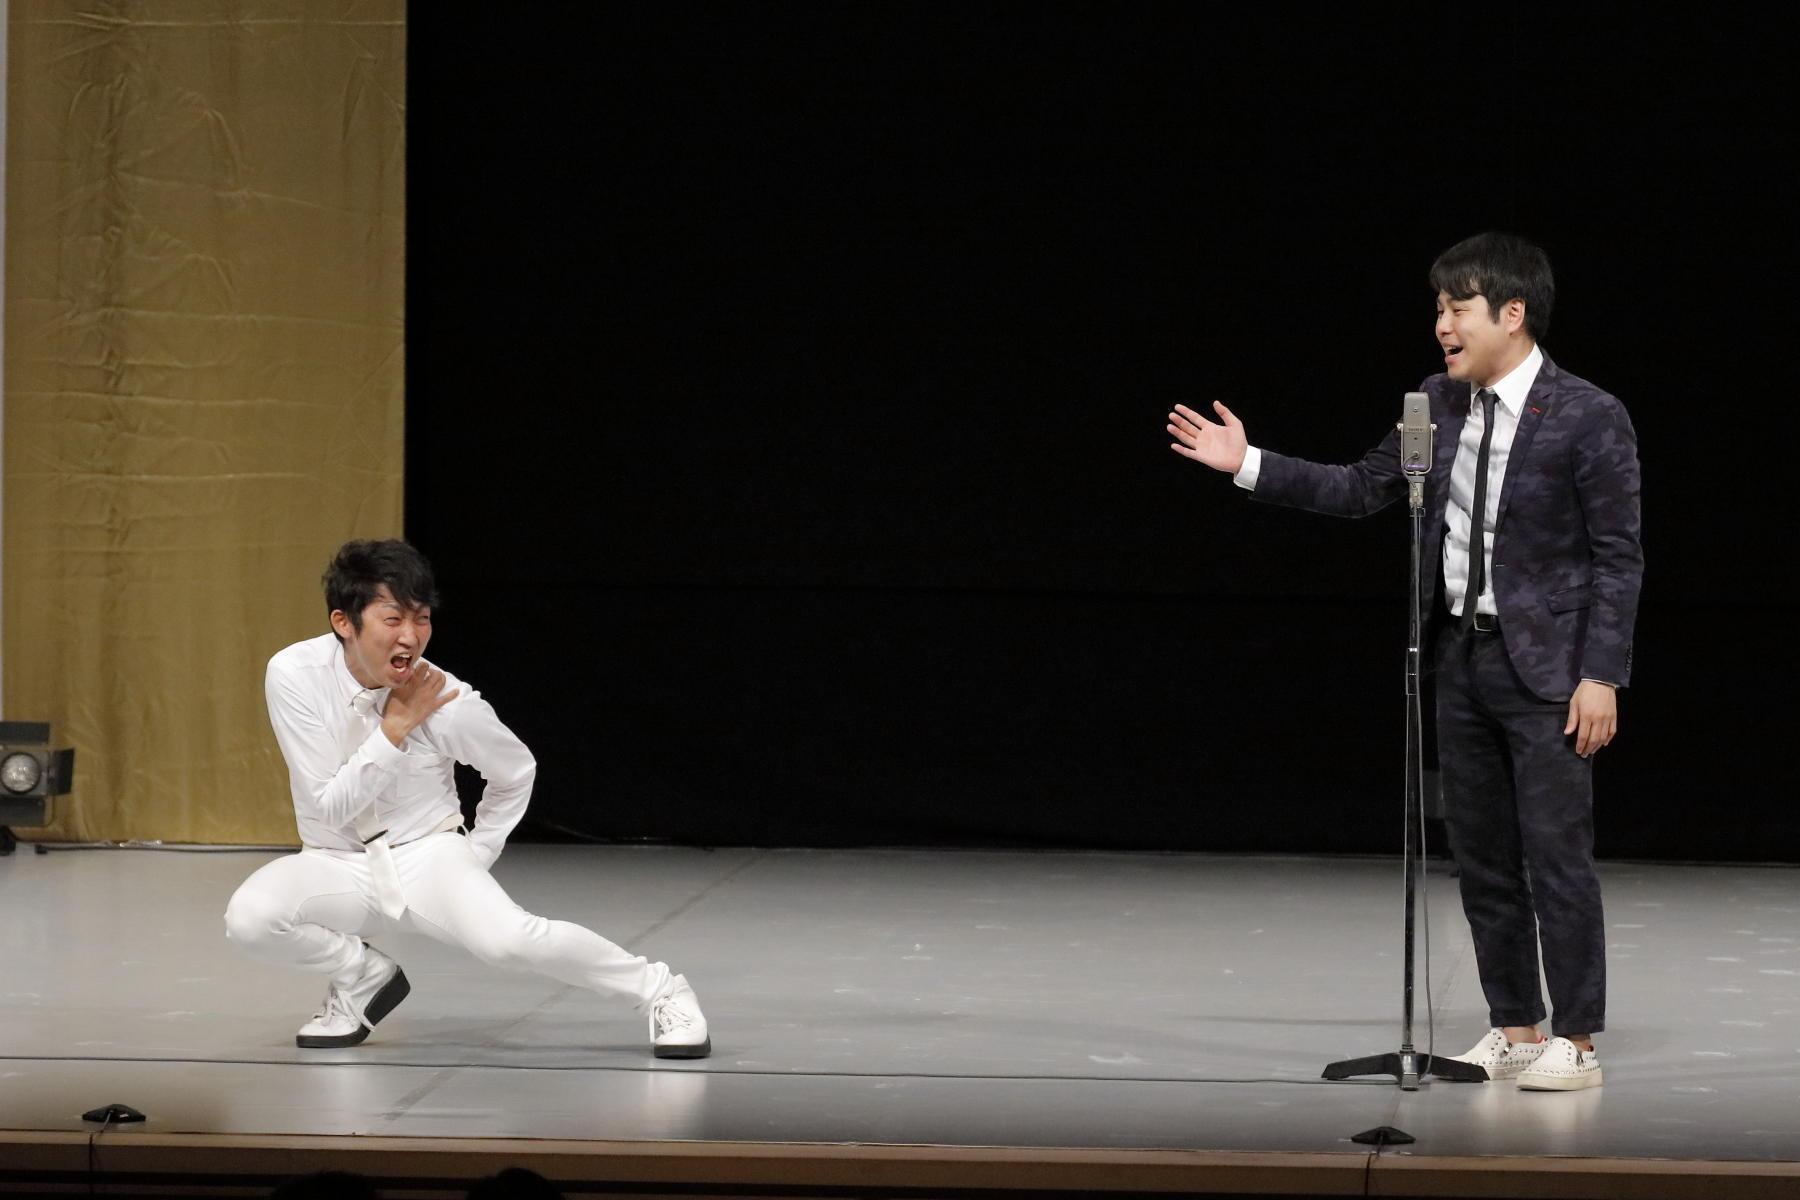 http://news.yoshimoto.co.jp/20171112123950-bfcbcbafdc3a4b8113f73f9105309969efec9aa6.jpg